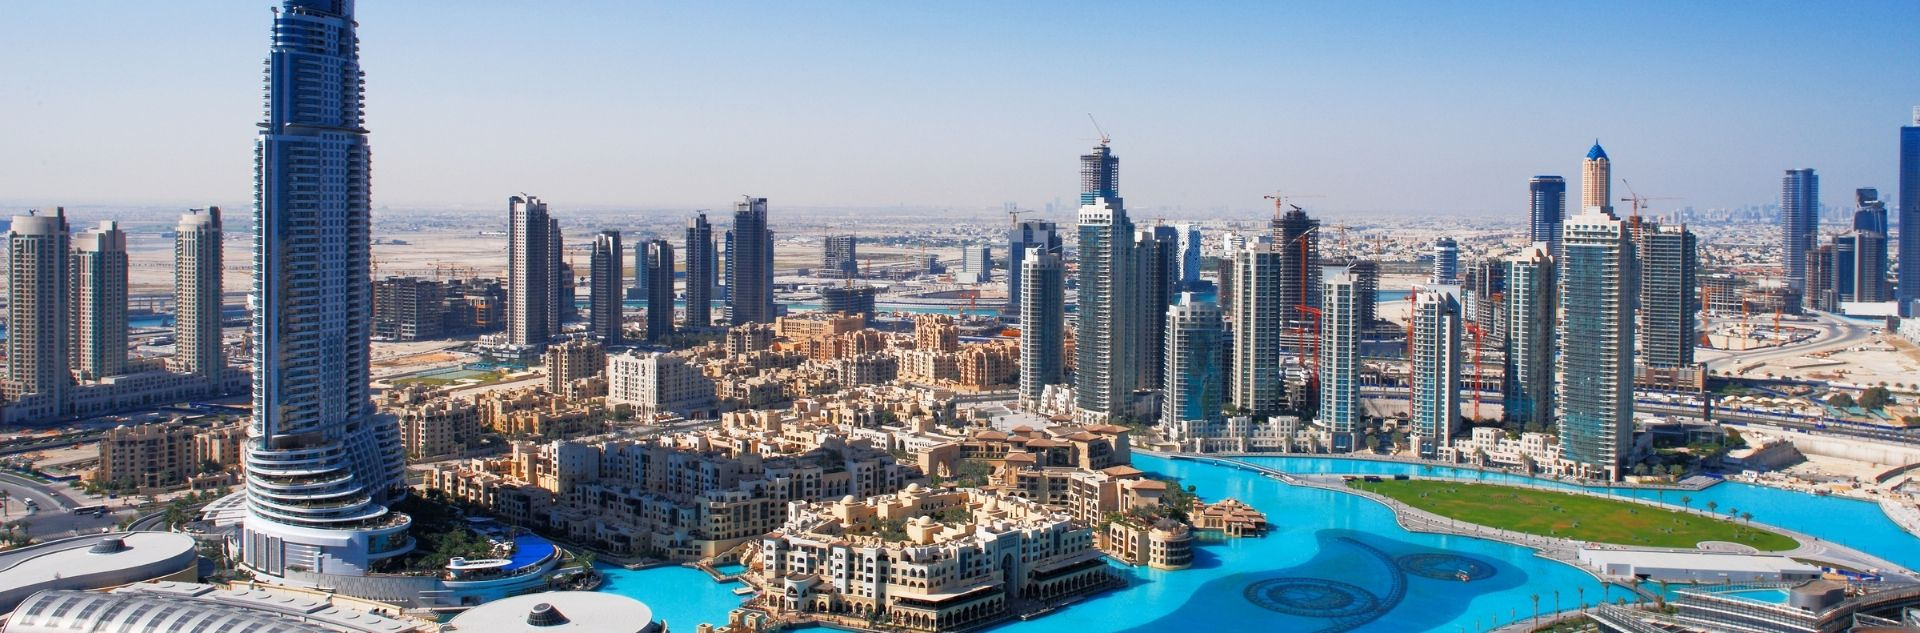 Dubai Skyline 1920x633